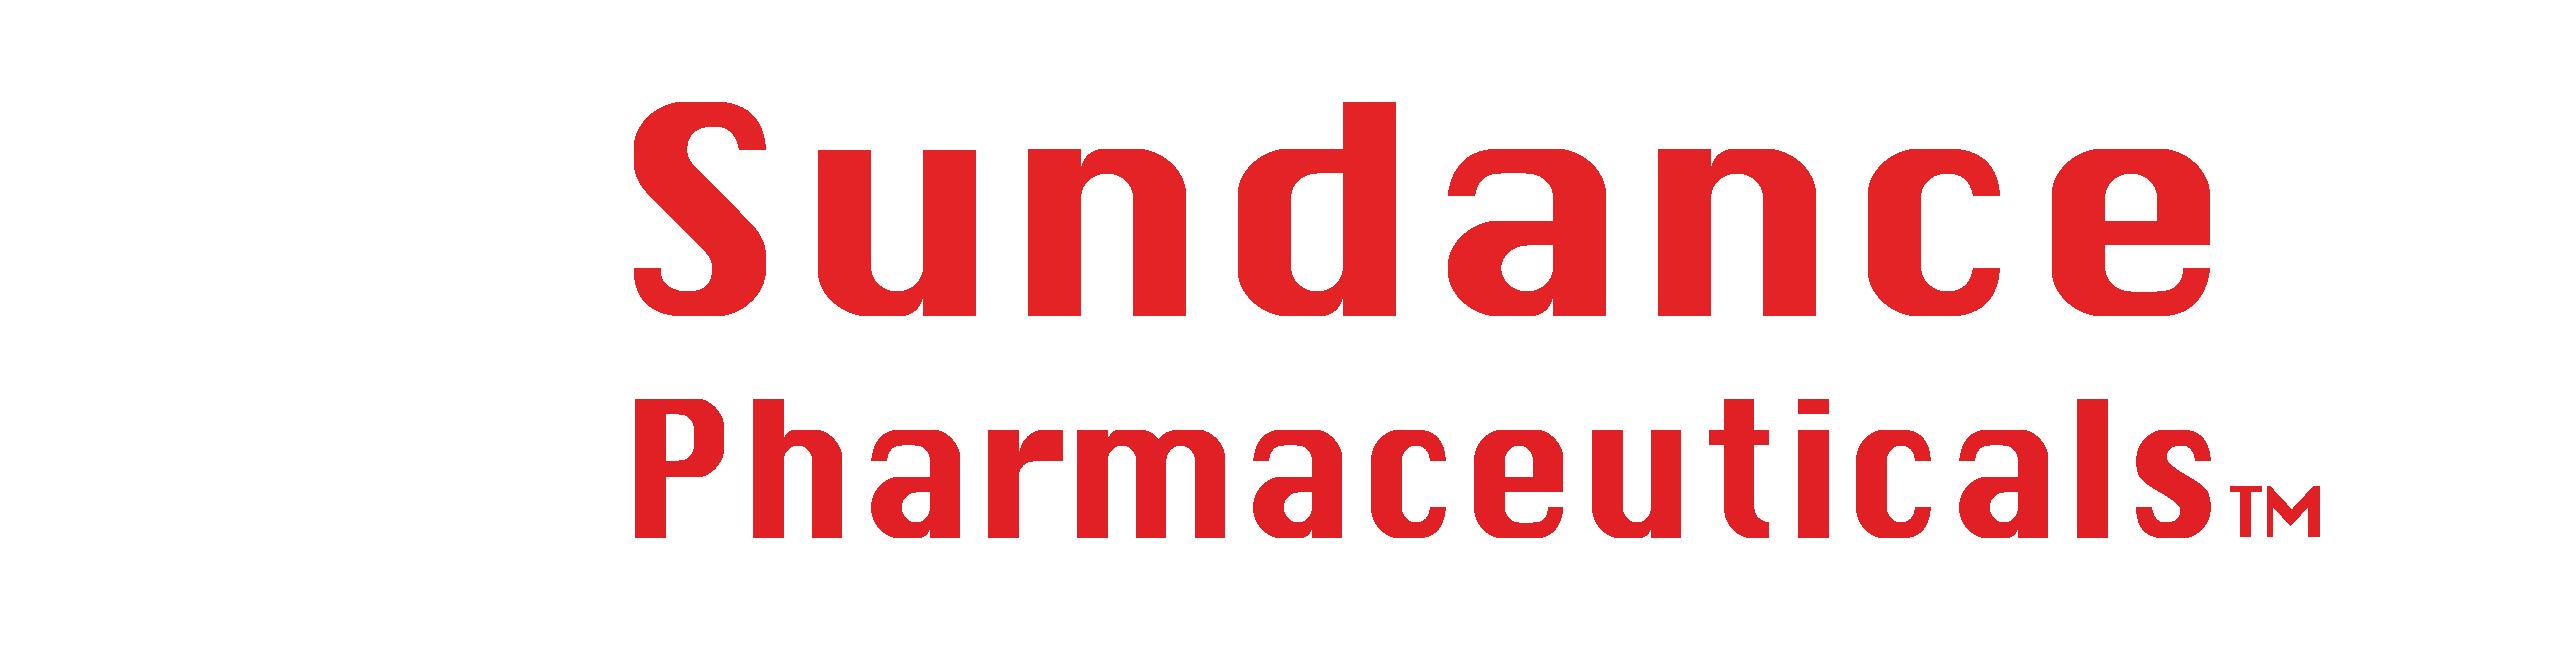 Sundance Pharmaceuticals